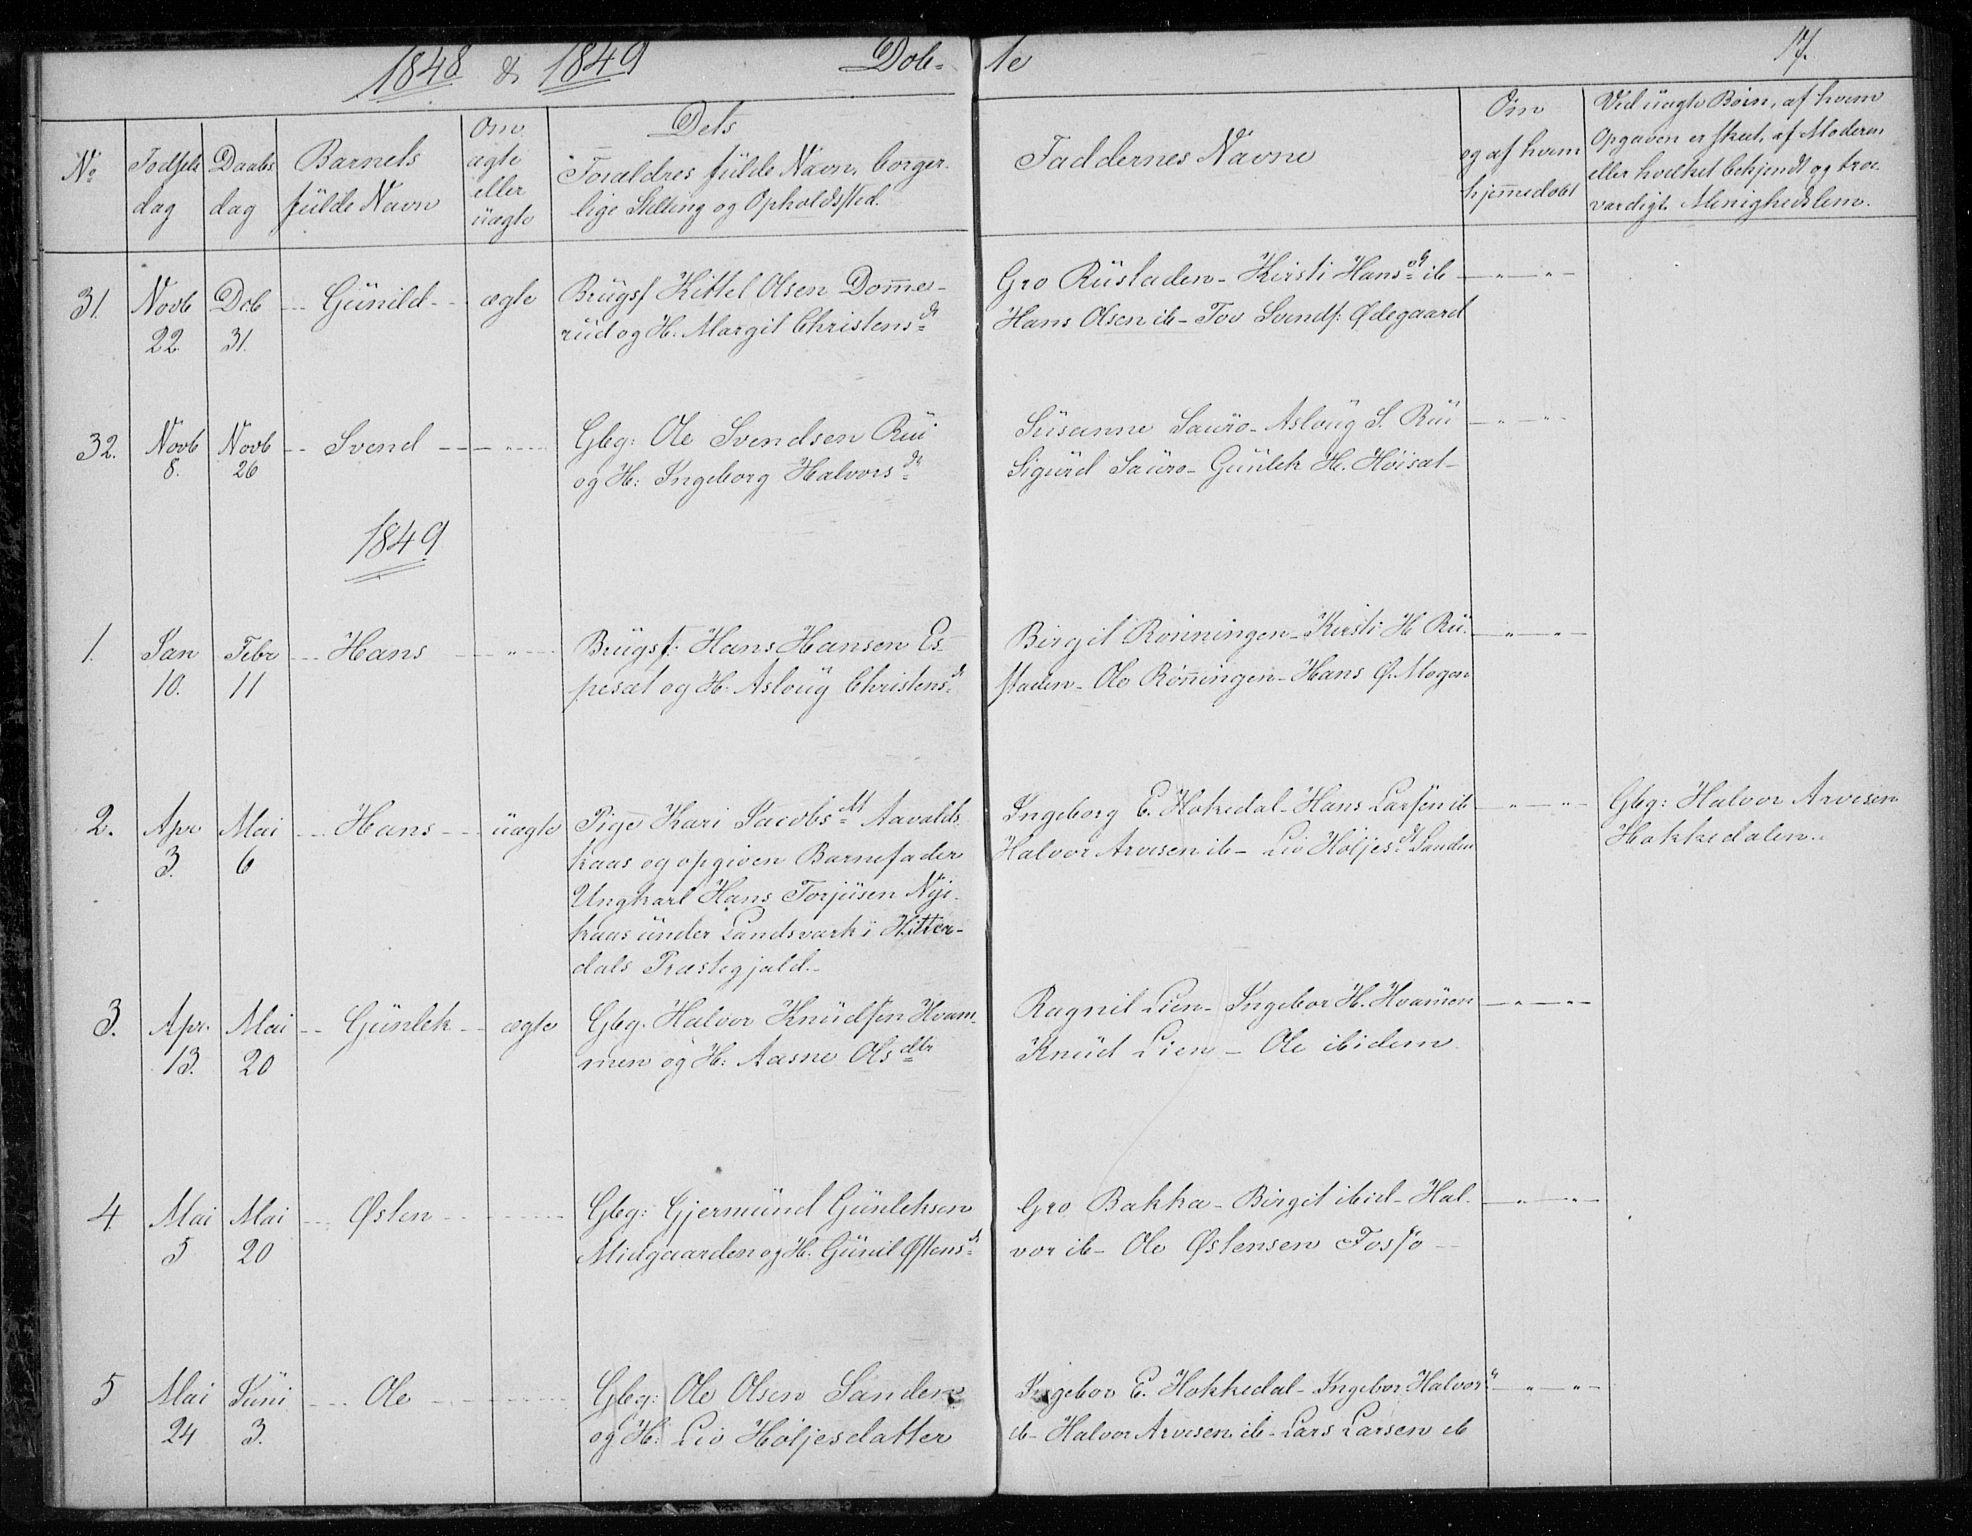 SAKO, Gransherad kirkebøker, F/Fb/L0003: Ministerialbok nr. II 3, 1844-1859, s. 17